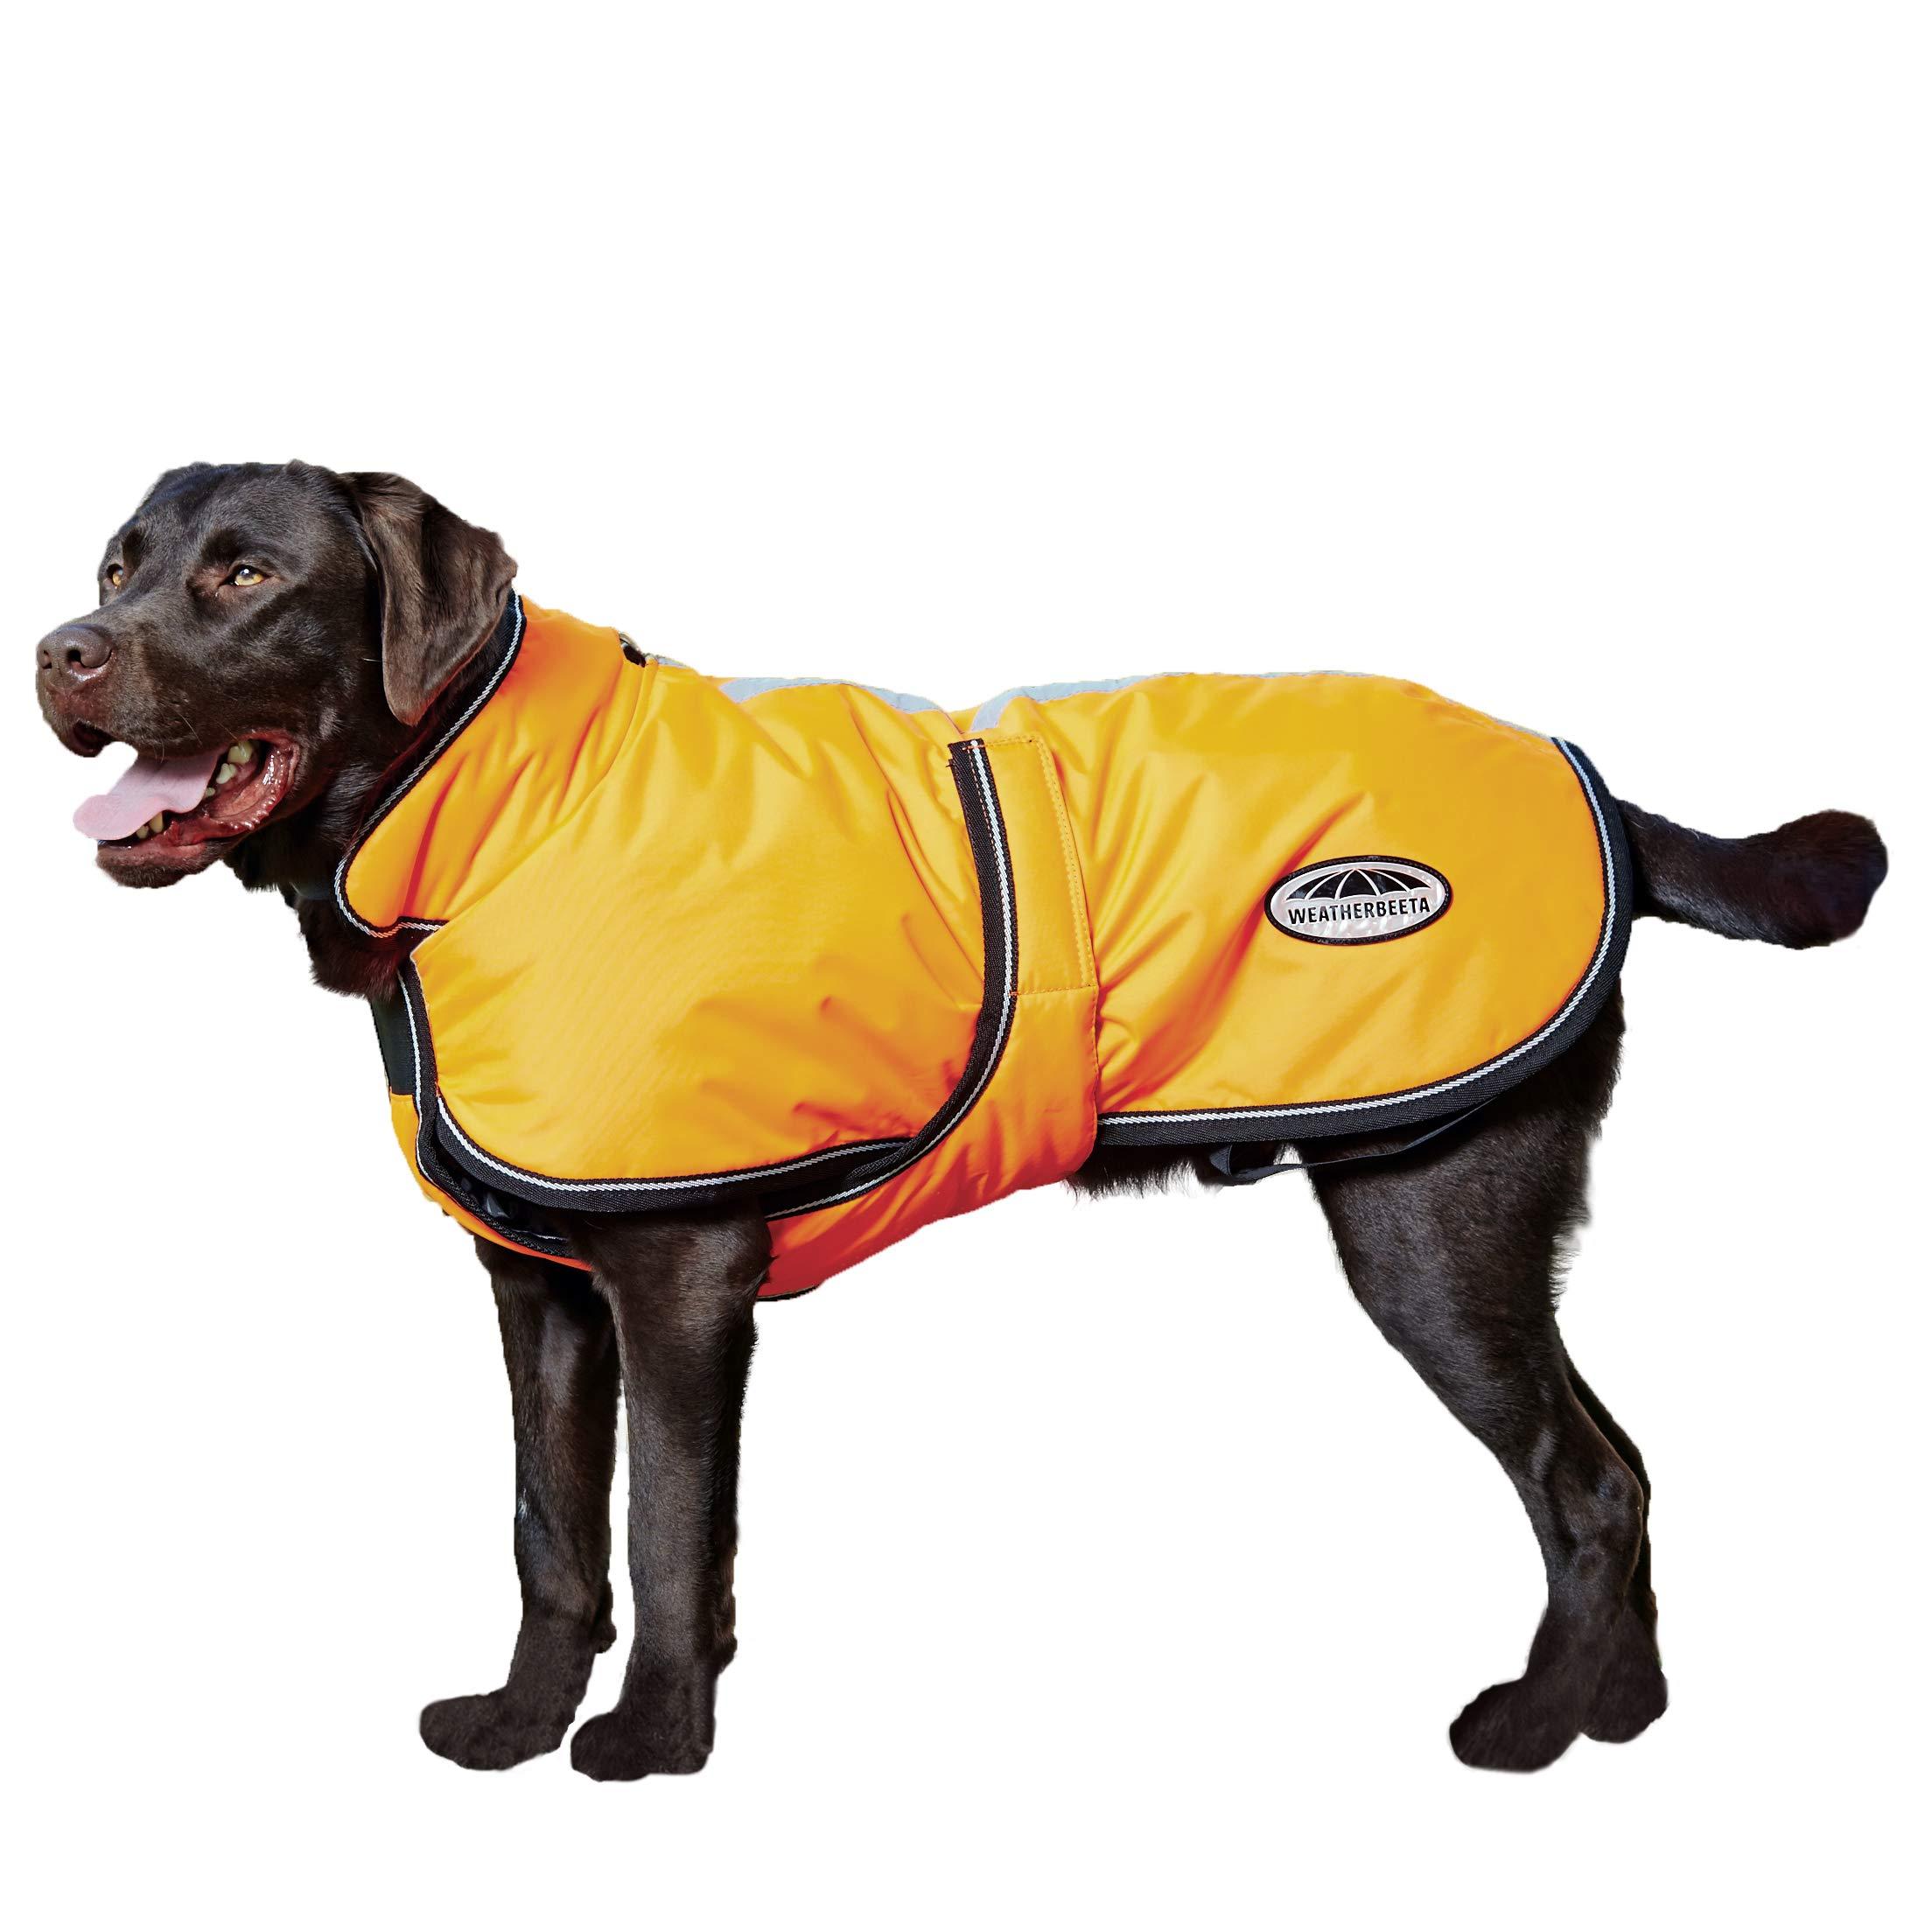 Weatherbeeta Reflective Parka 300D Deluxe Dog Coat Orange 14'' by Weatherbeeta